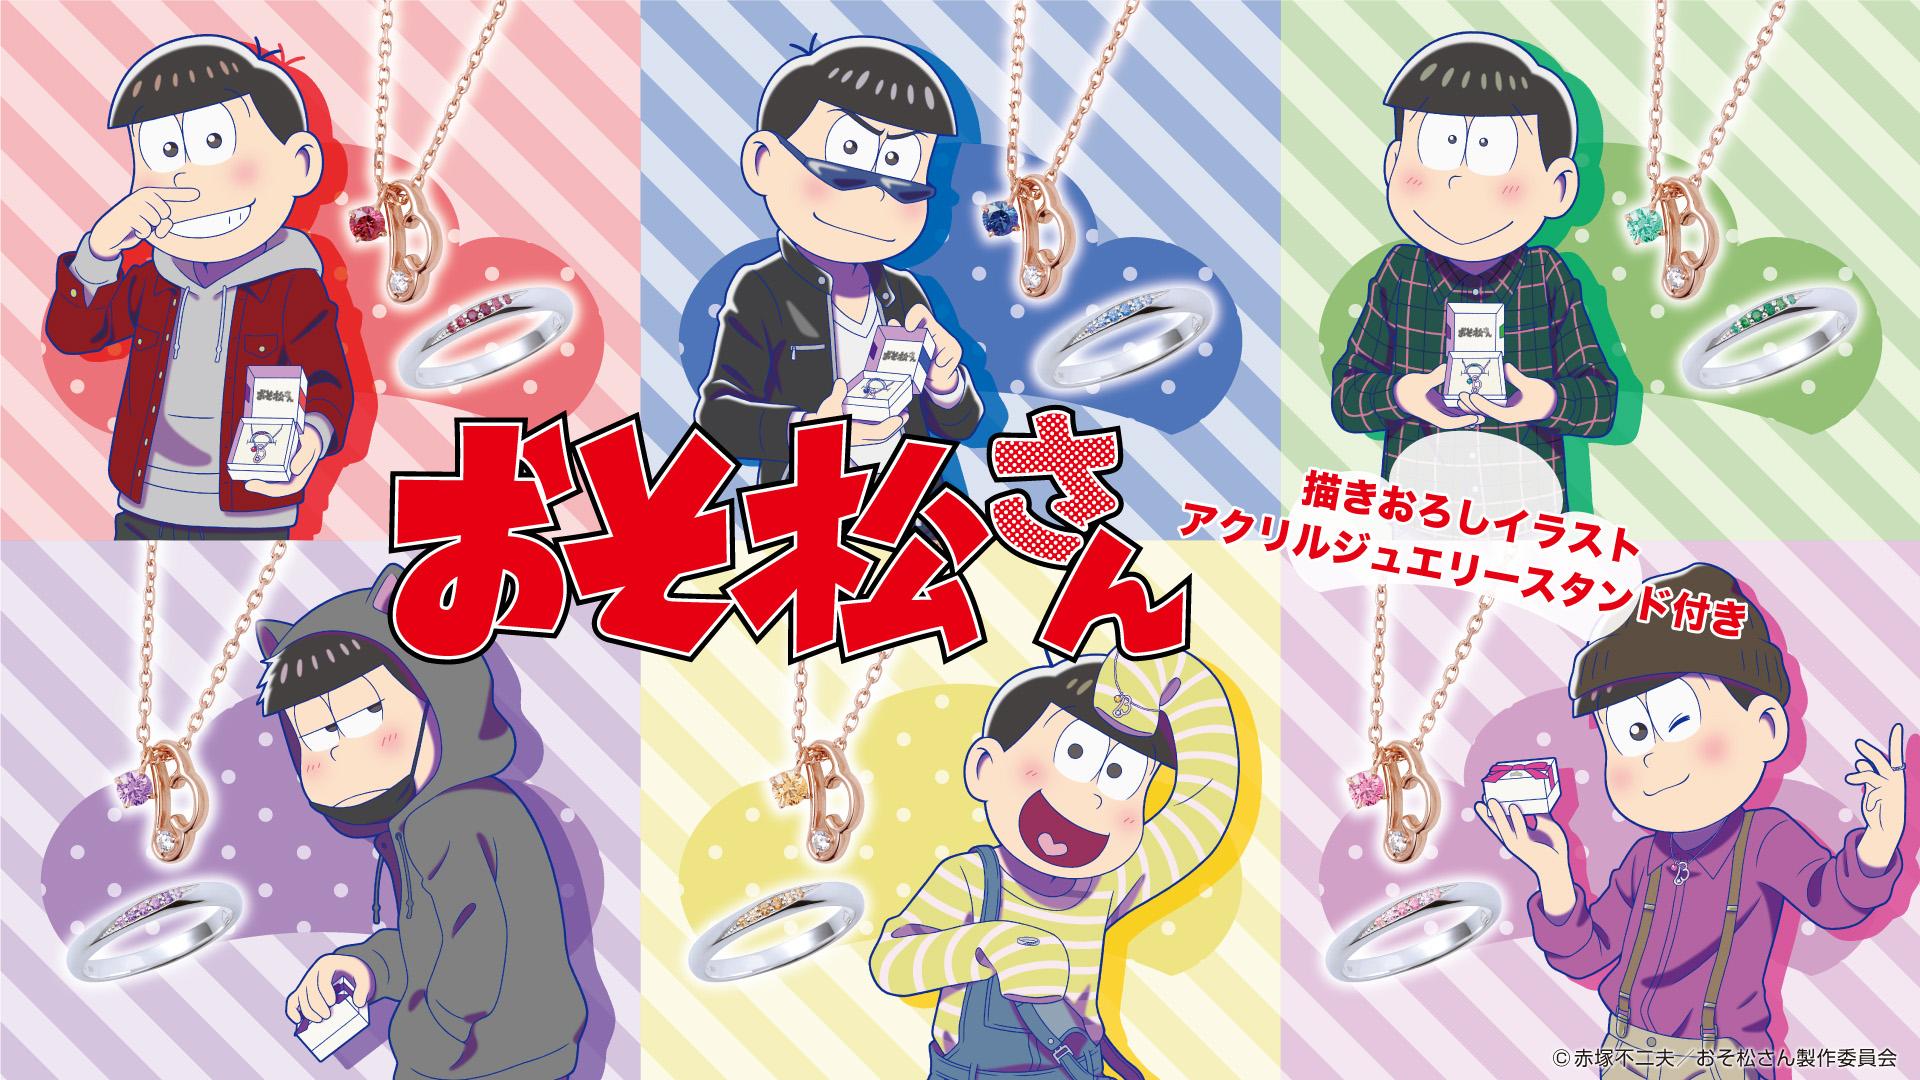 TVアニメ『おそ松さん』コラボジュエリー 12/1(火)から受注販売開始!